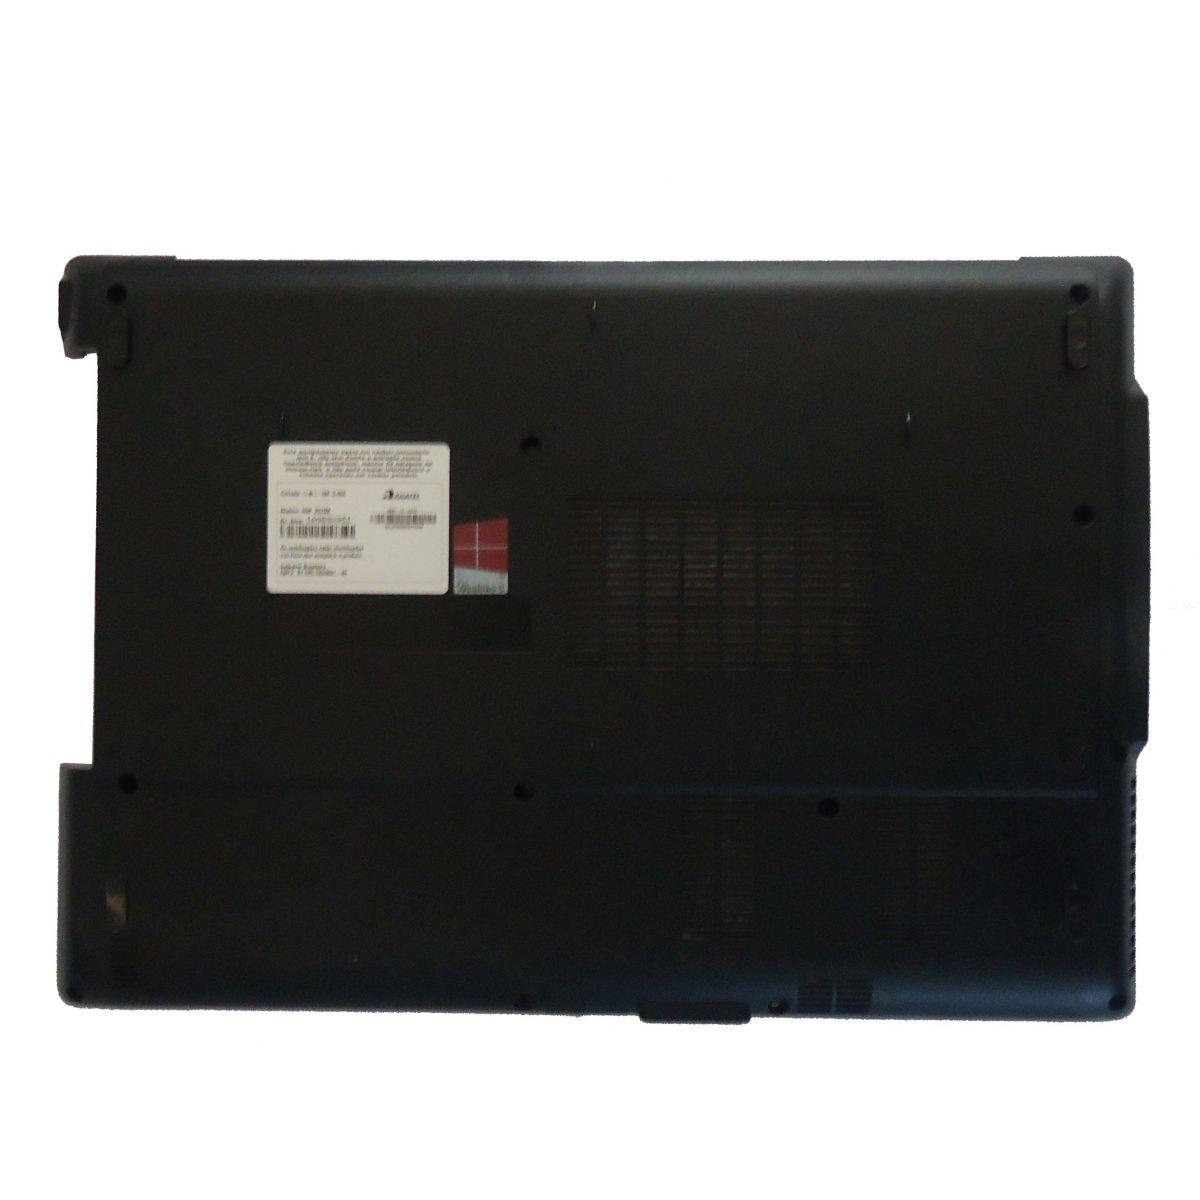 Carcaça Base Inferior Notebook Positivo Sim+ 2750m